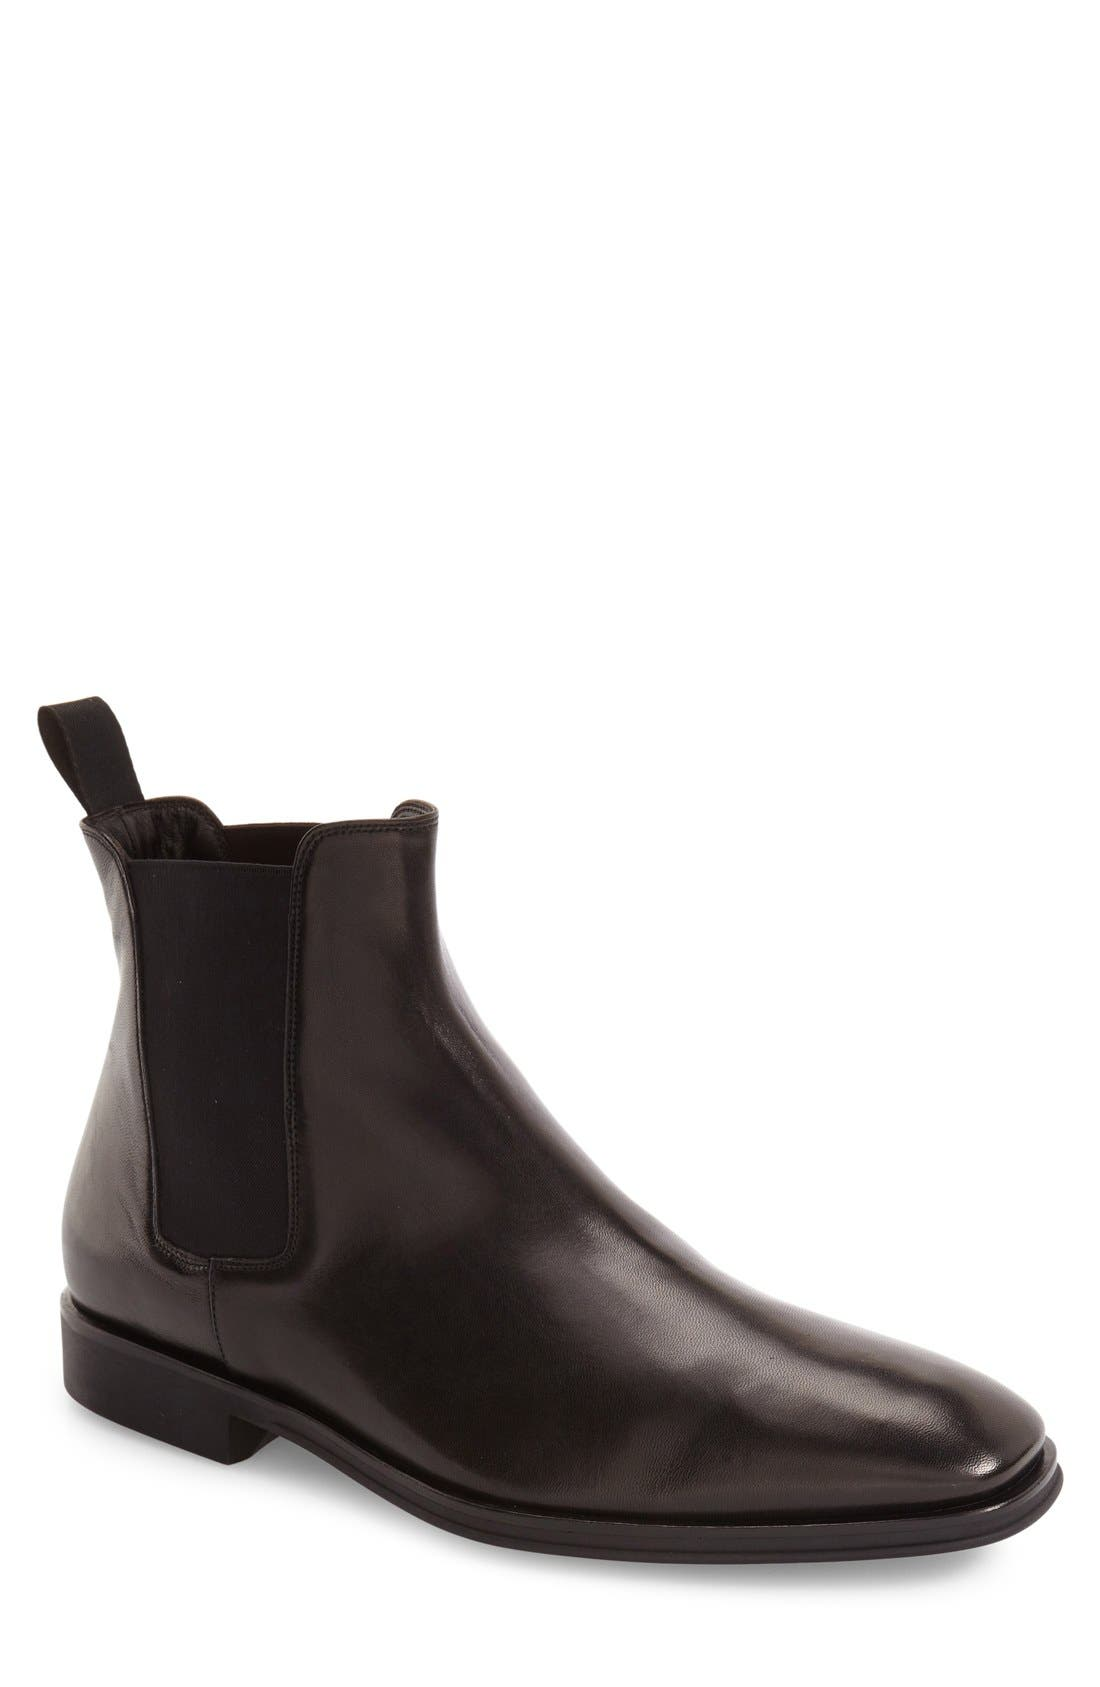 Enrico Chelsea Boot,                         Main,                         color, BLACK LEATHER